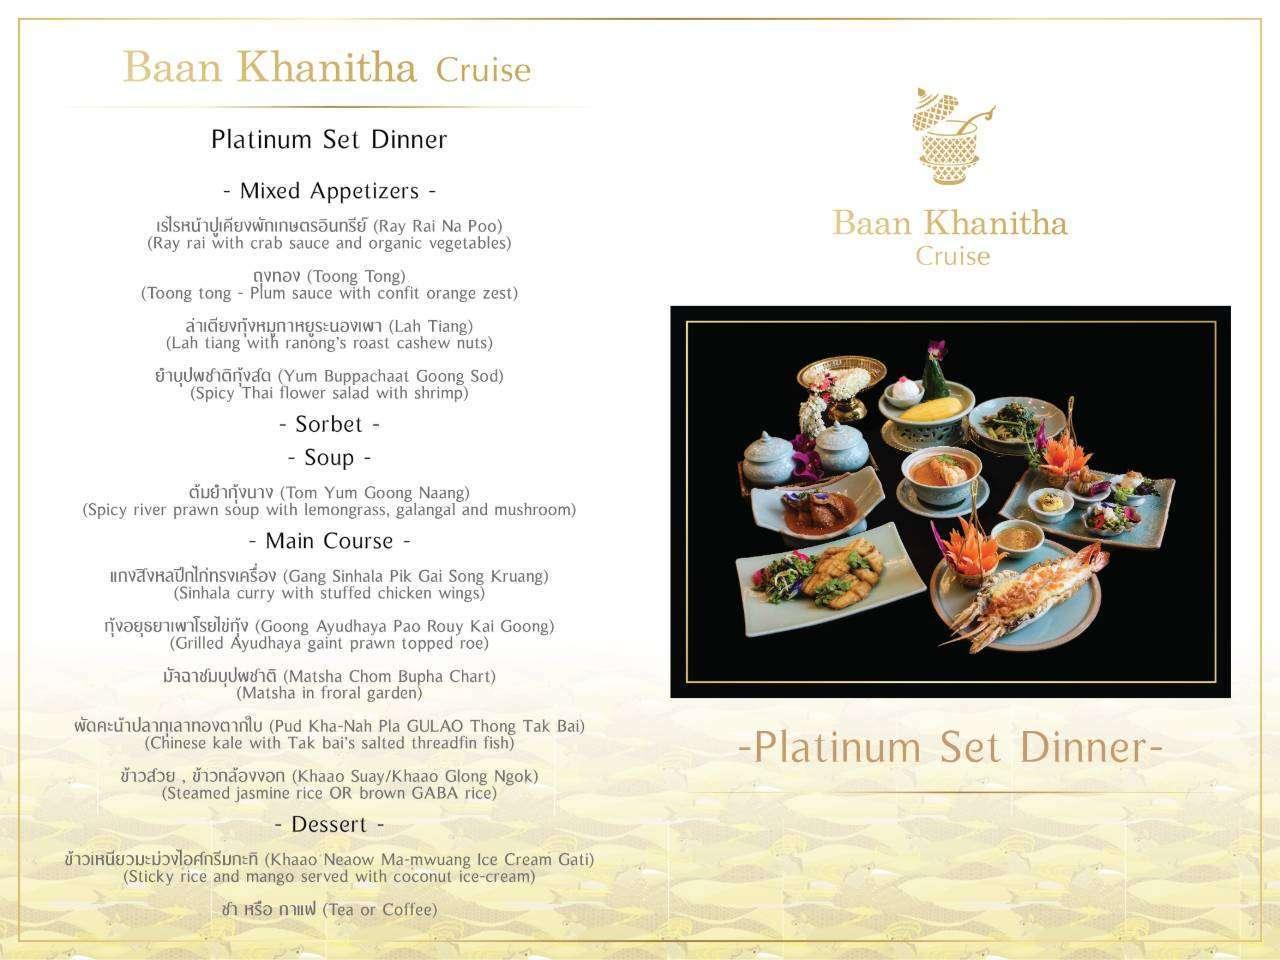 Menu of the Platinum Set Dinner during the Job Khanitha Cruise